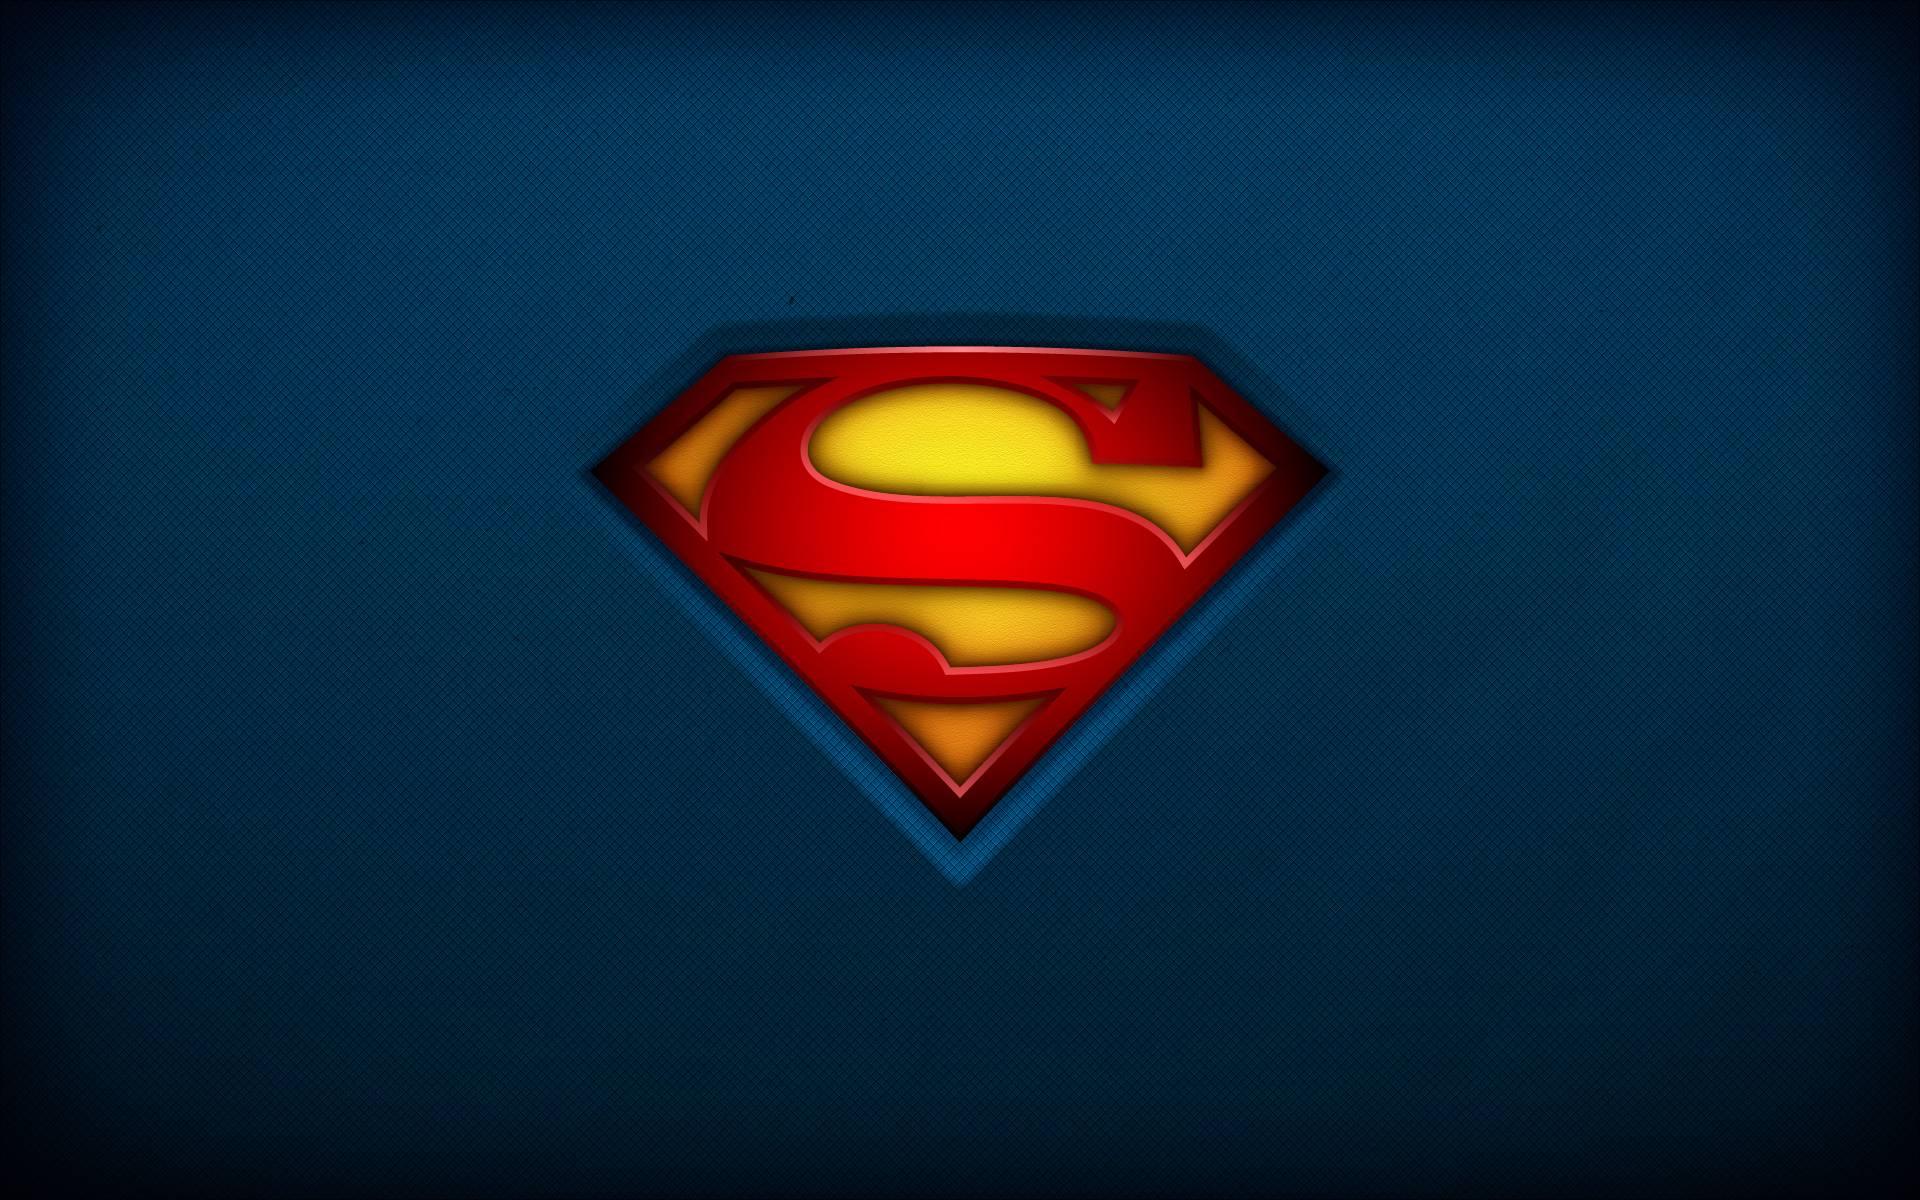 Hd wallpaper vivo - Superman Wallpapers Hd Wallpapers